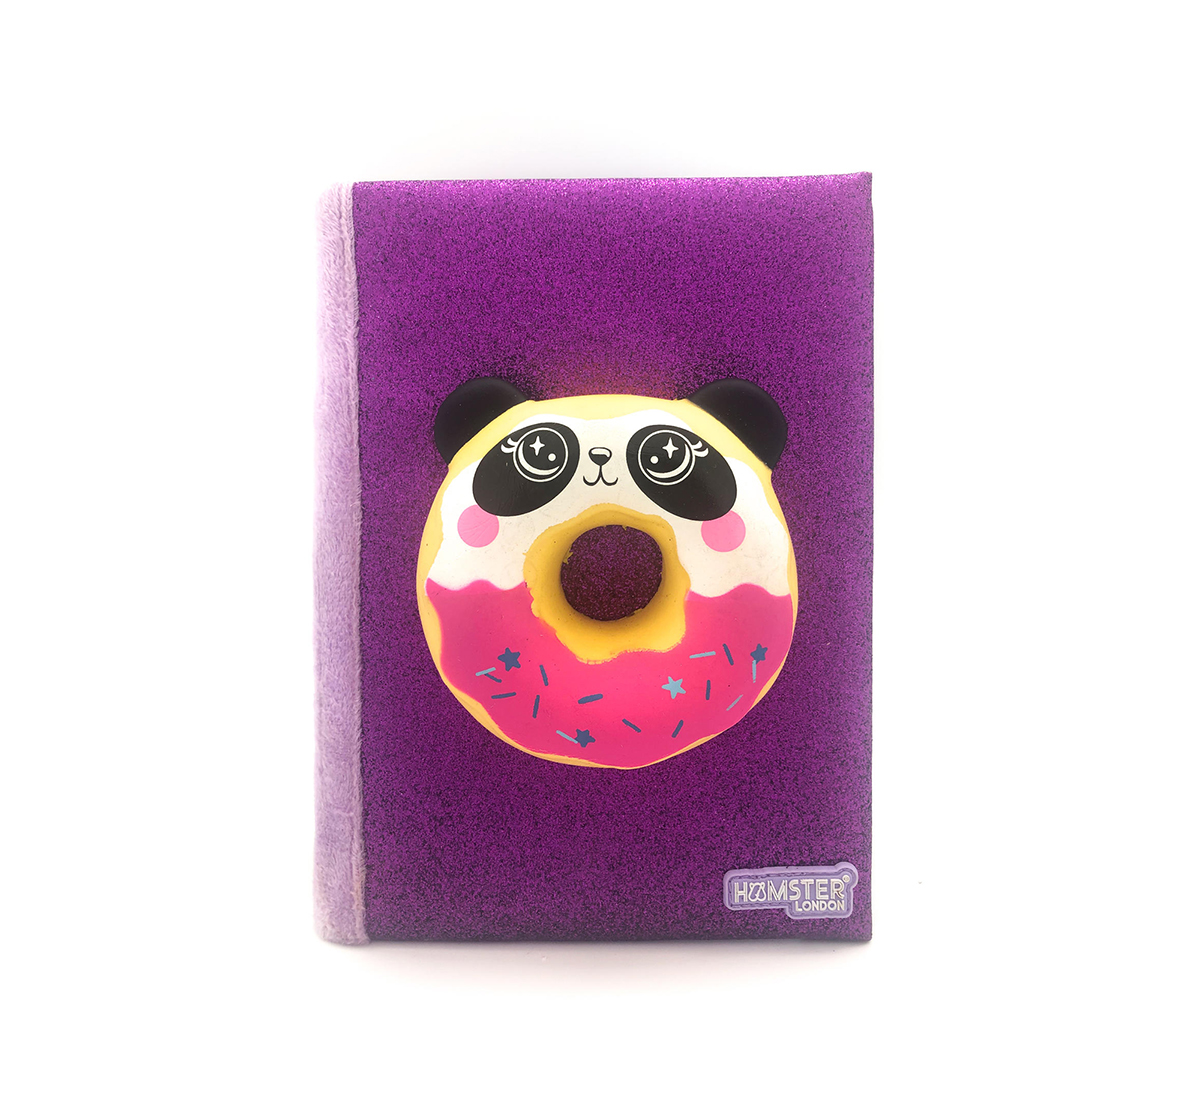 Hamster London | Hamster London Panda Doughnut Diary for Kids age 3Y+ (Purple)